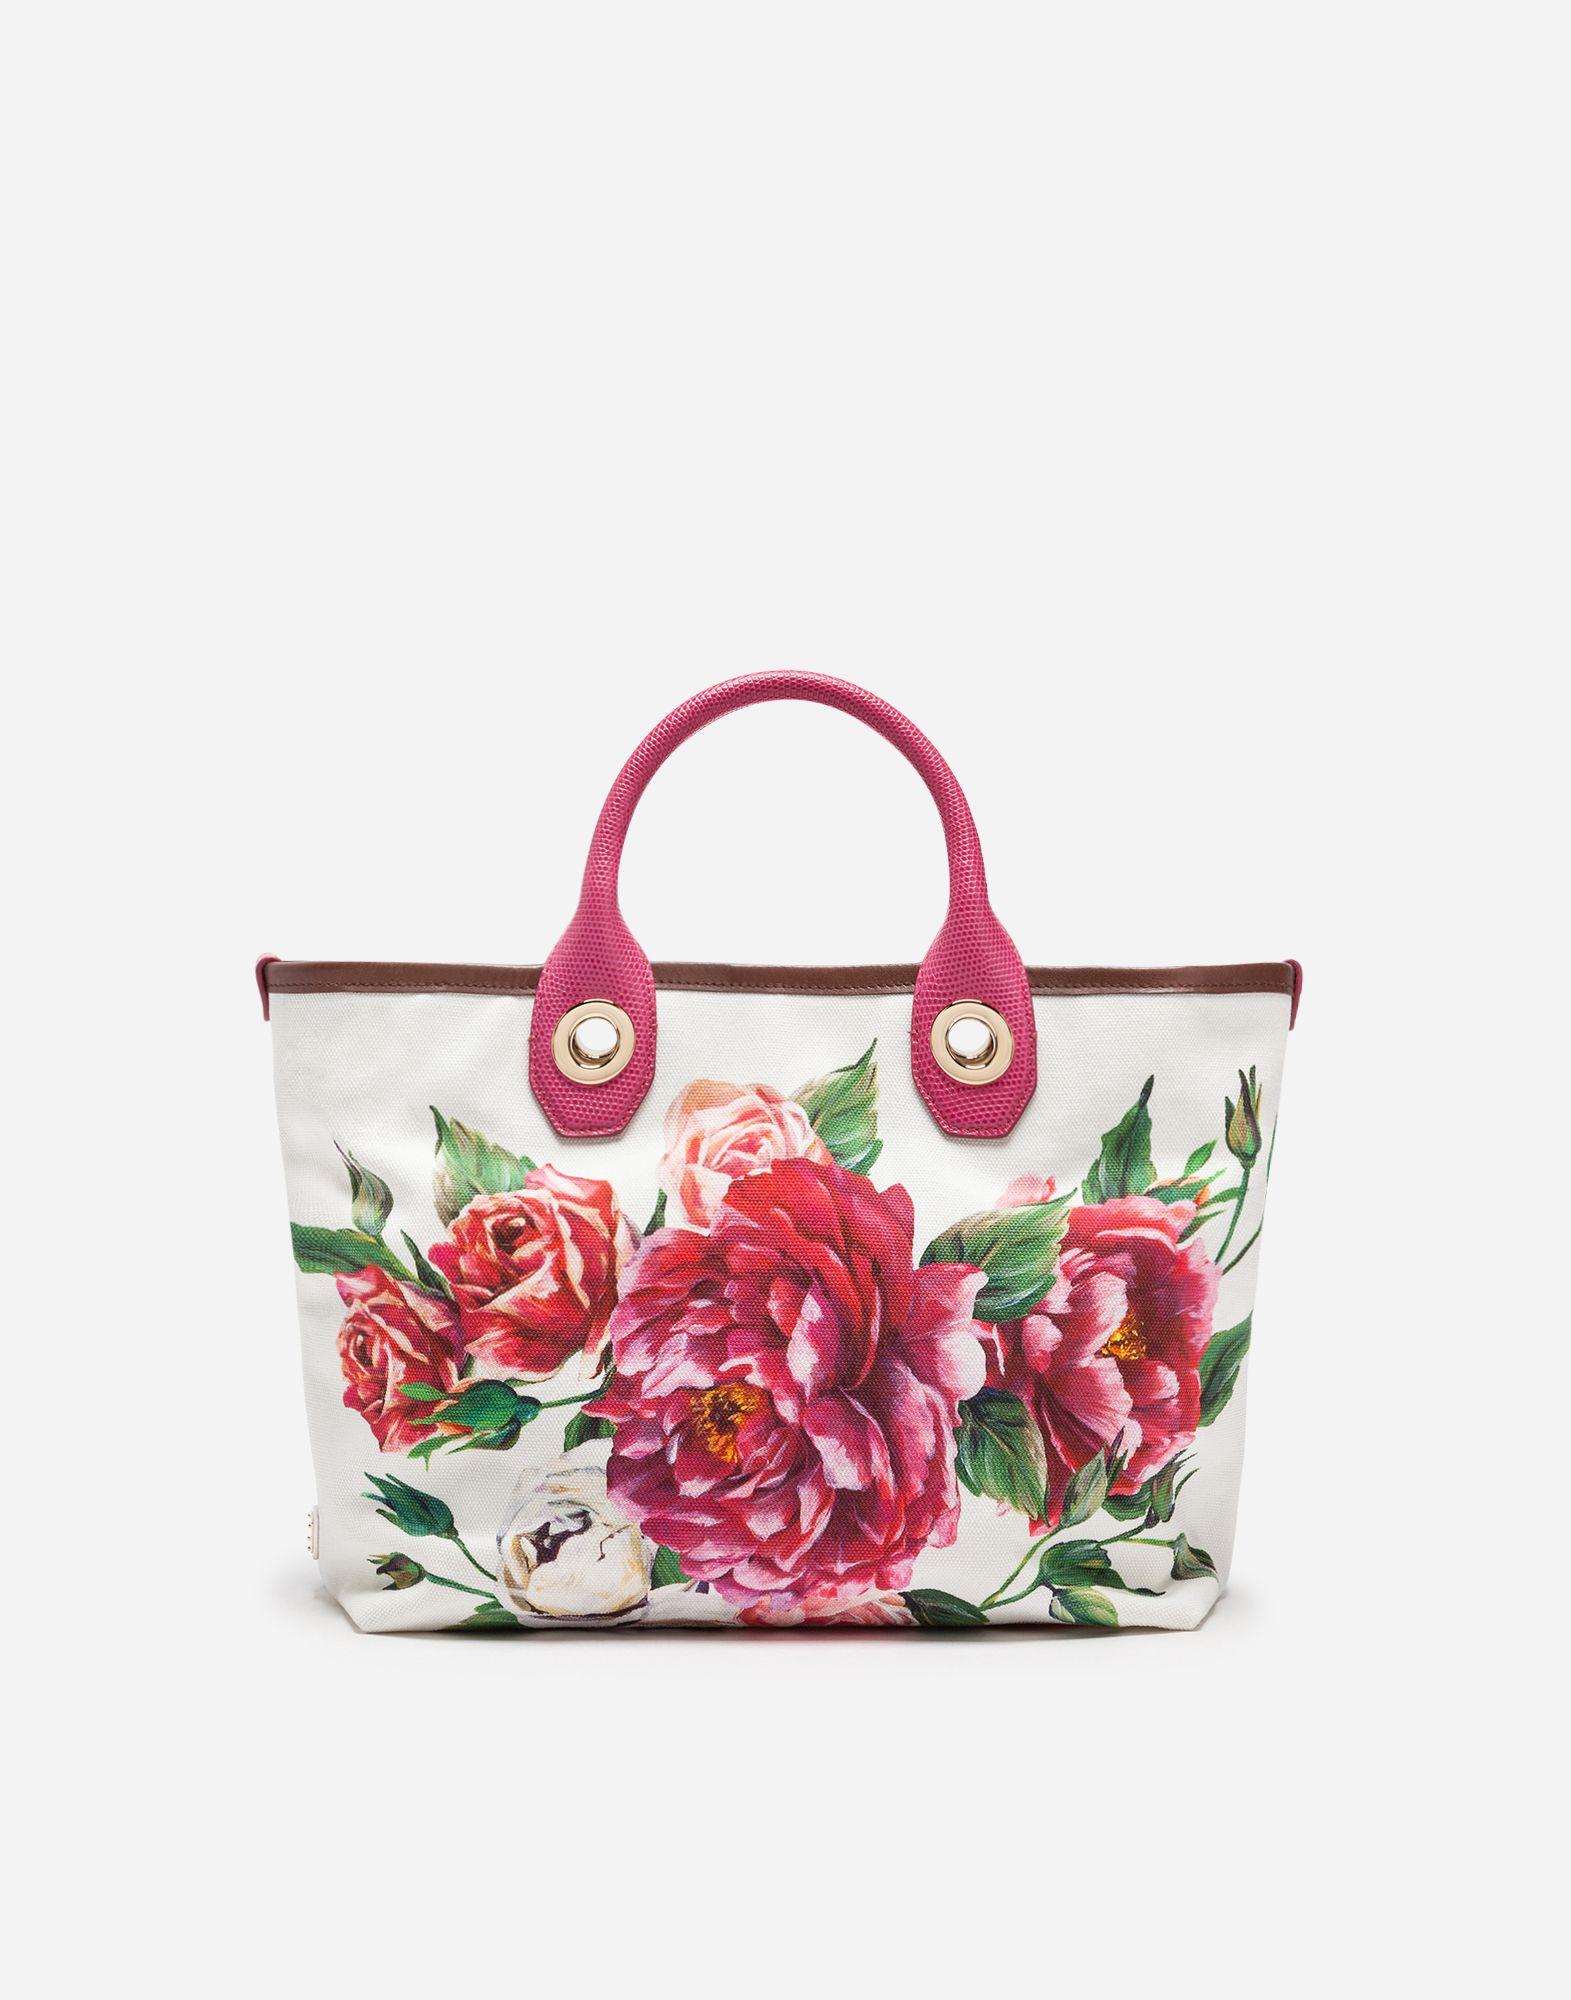 4d1204406cd1 Dolce   Gabbana - Small Capri shopping bag in Peony-print canvas ...